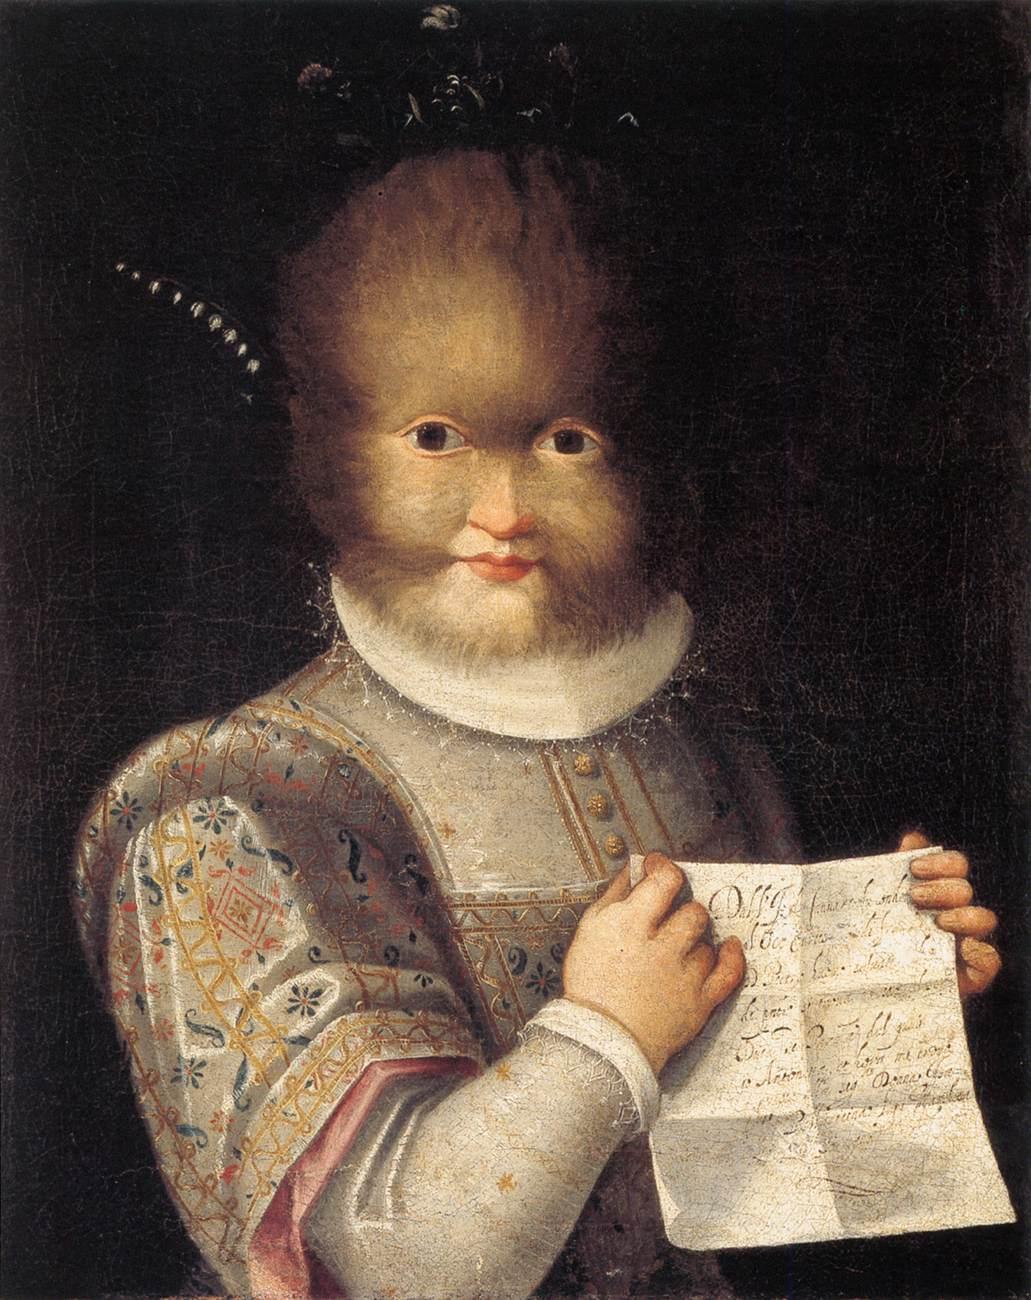 Lavinia Fontana's Portrait of Antonietta Gonzalez, 1595.